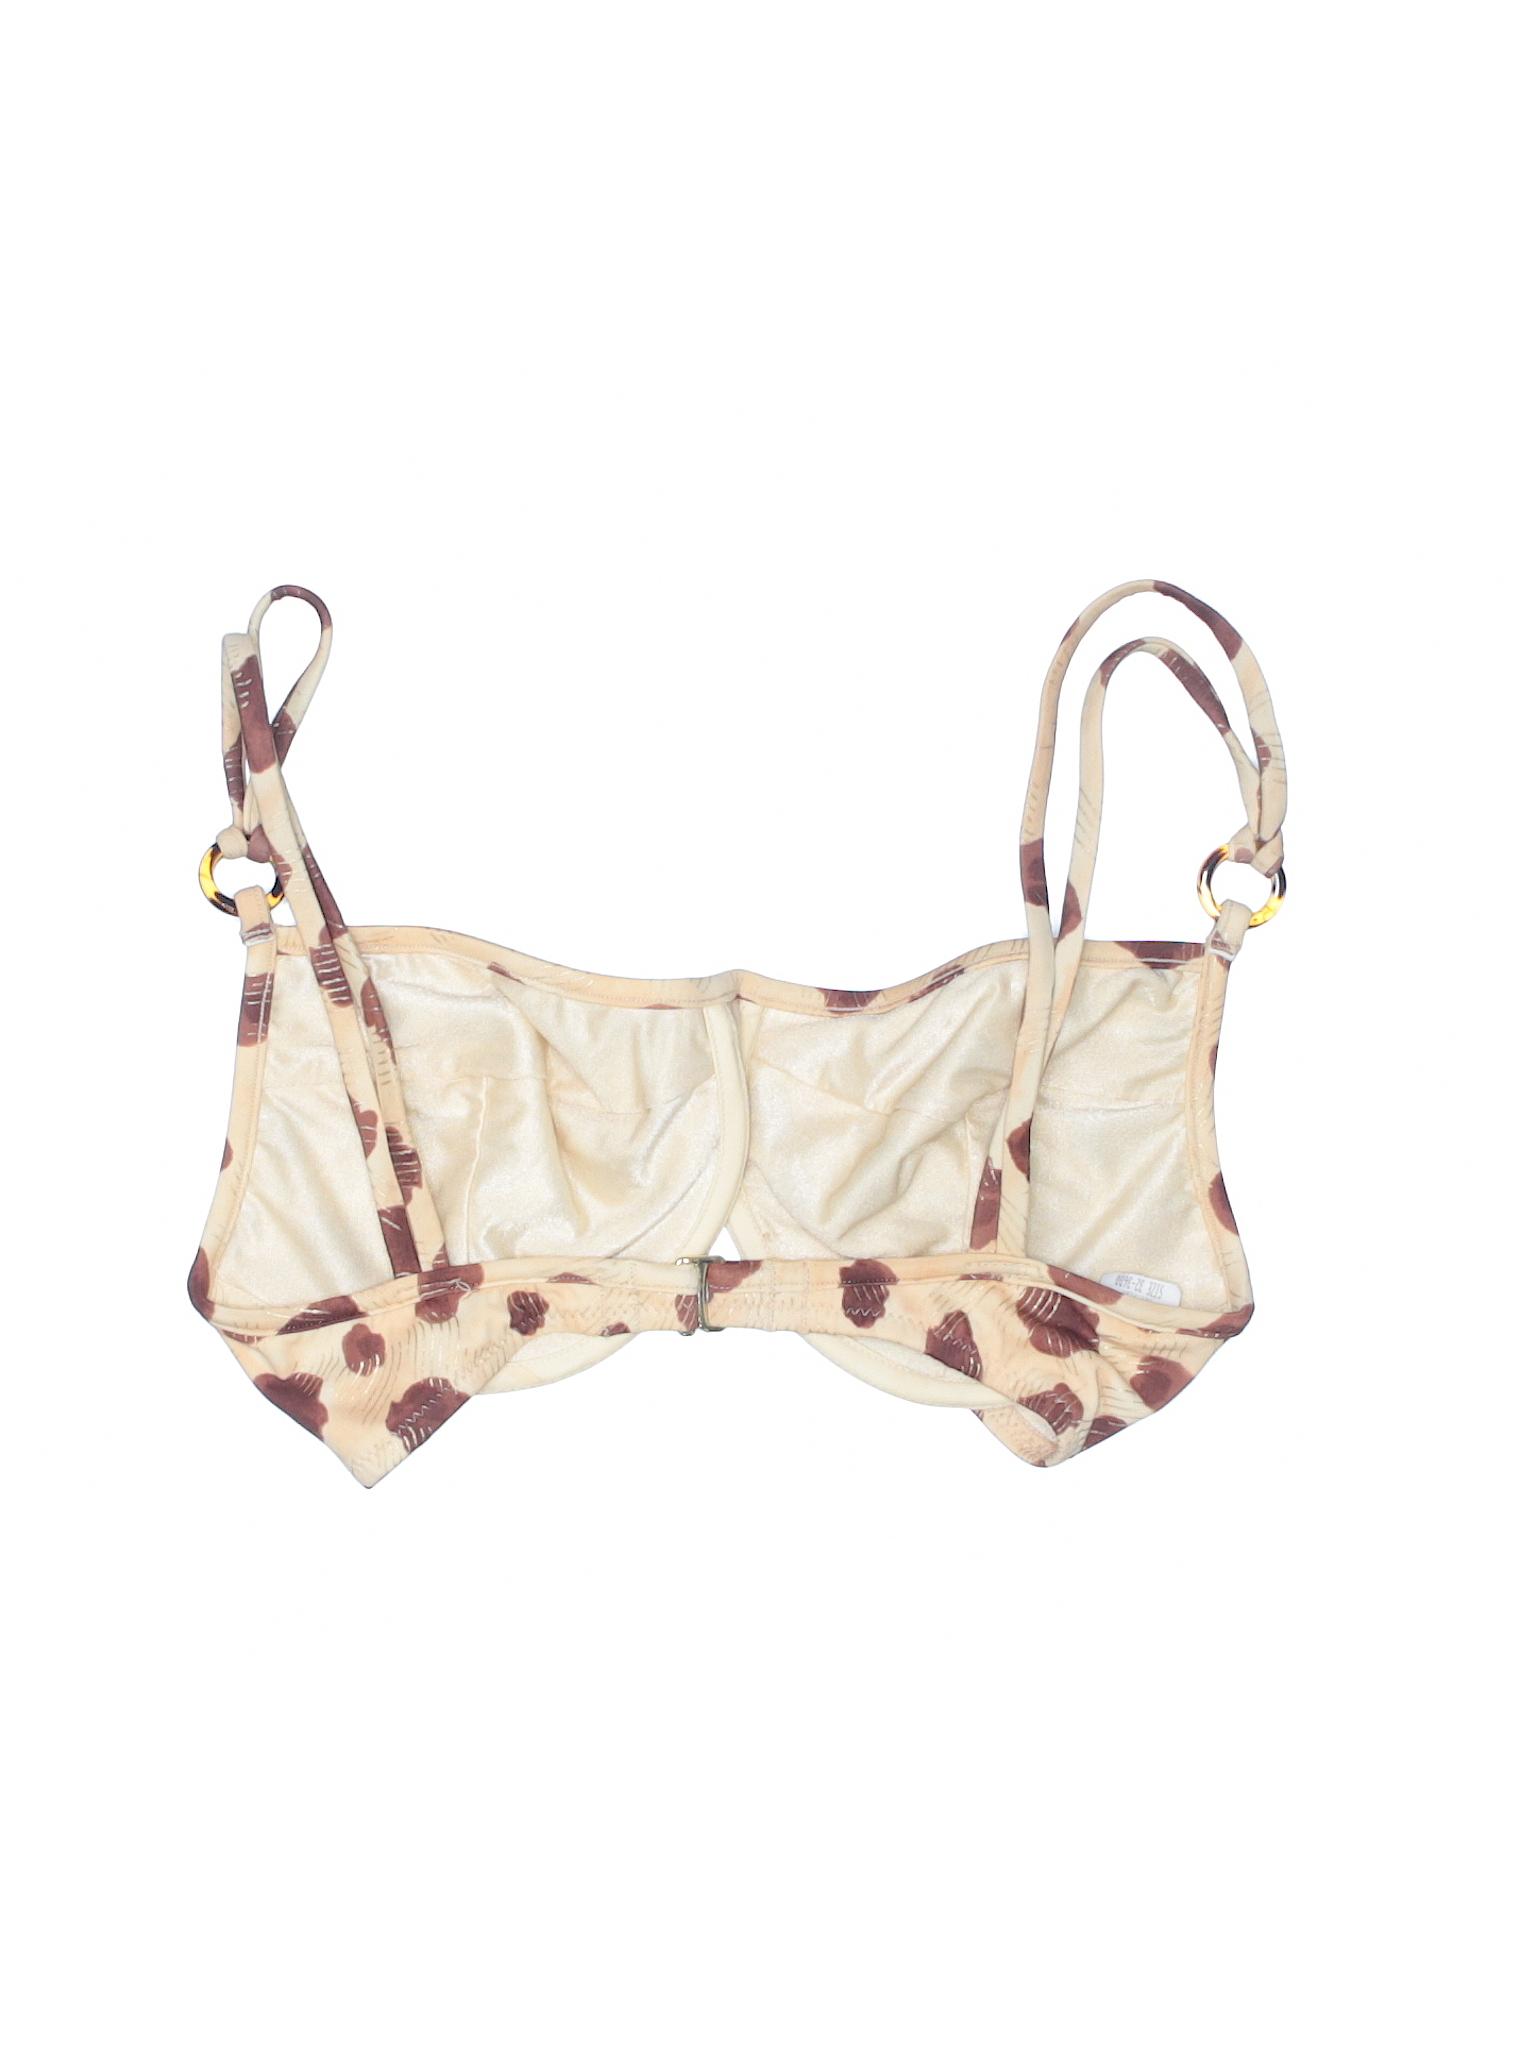 Grinna Swimsuit Tara Tara Tara Swimsuit Grinna Boutique Boutique Top Boutique Top wUxq1nU4aO